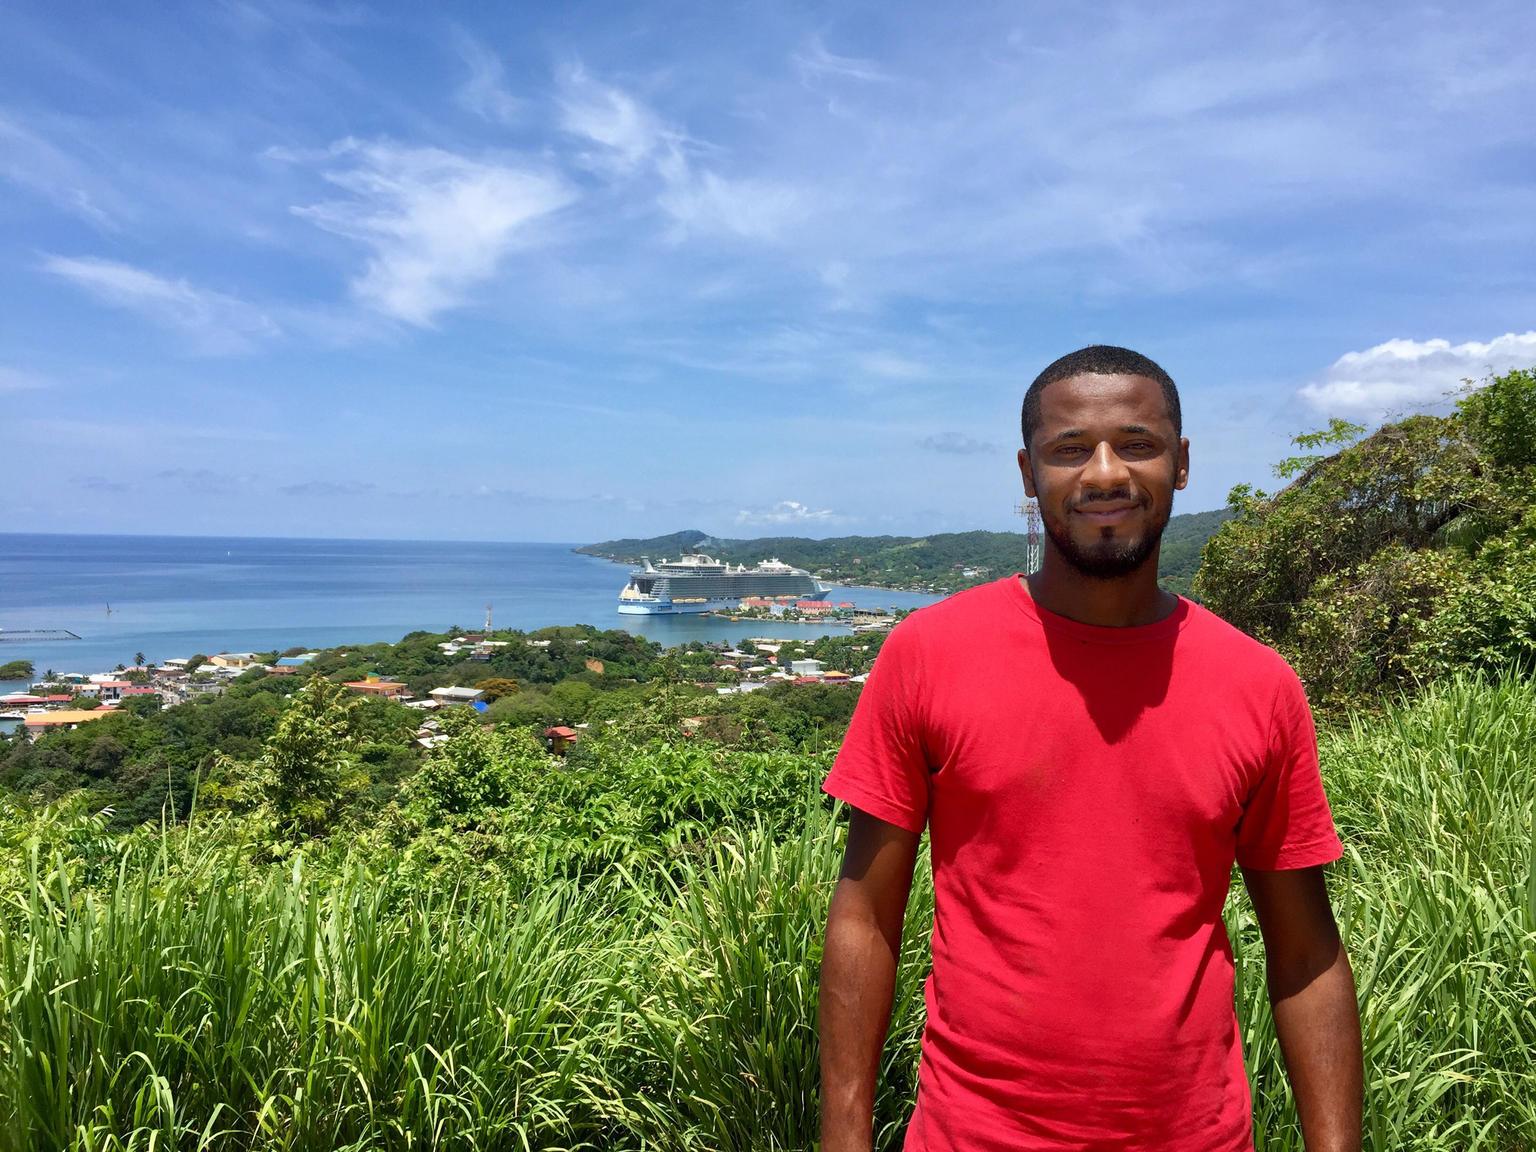 MÁS FOTOS, Customizable Best Of Roatan Island Tour in Honduras